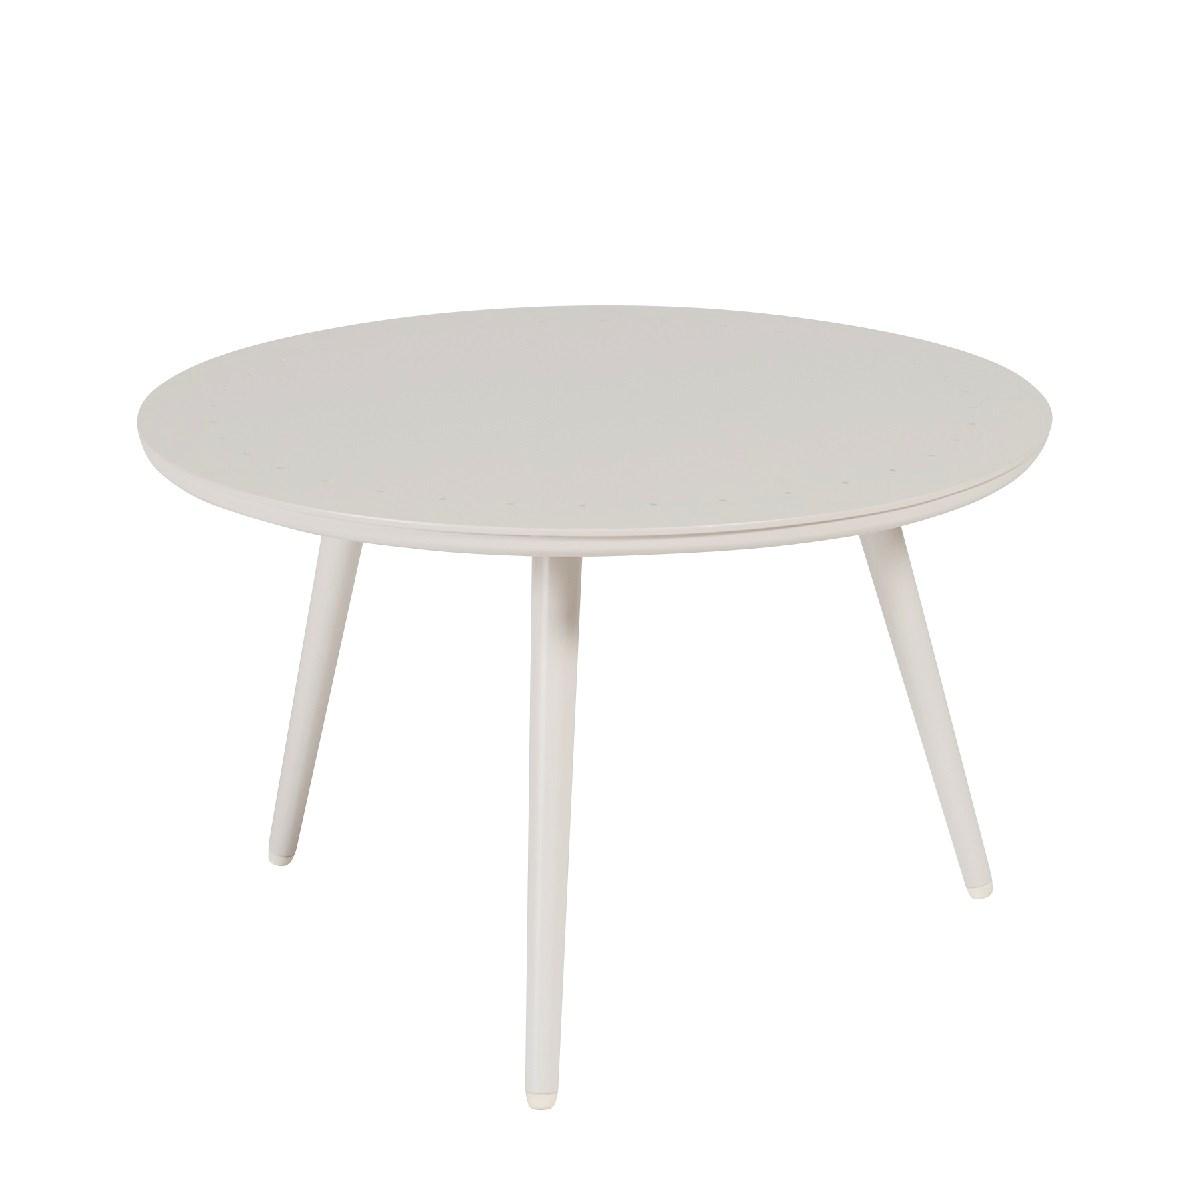 Table basse de jardin ronde en aluminium D60 beige clair